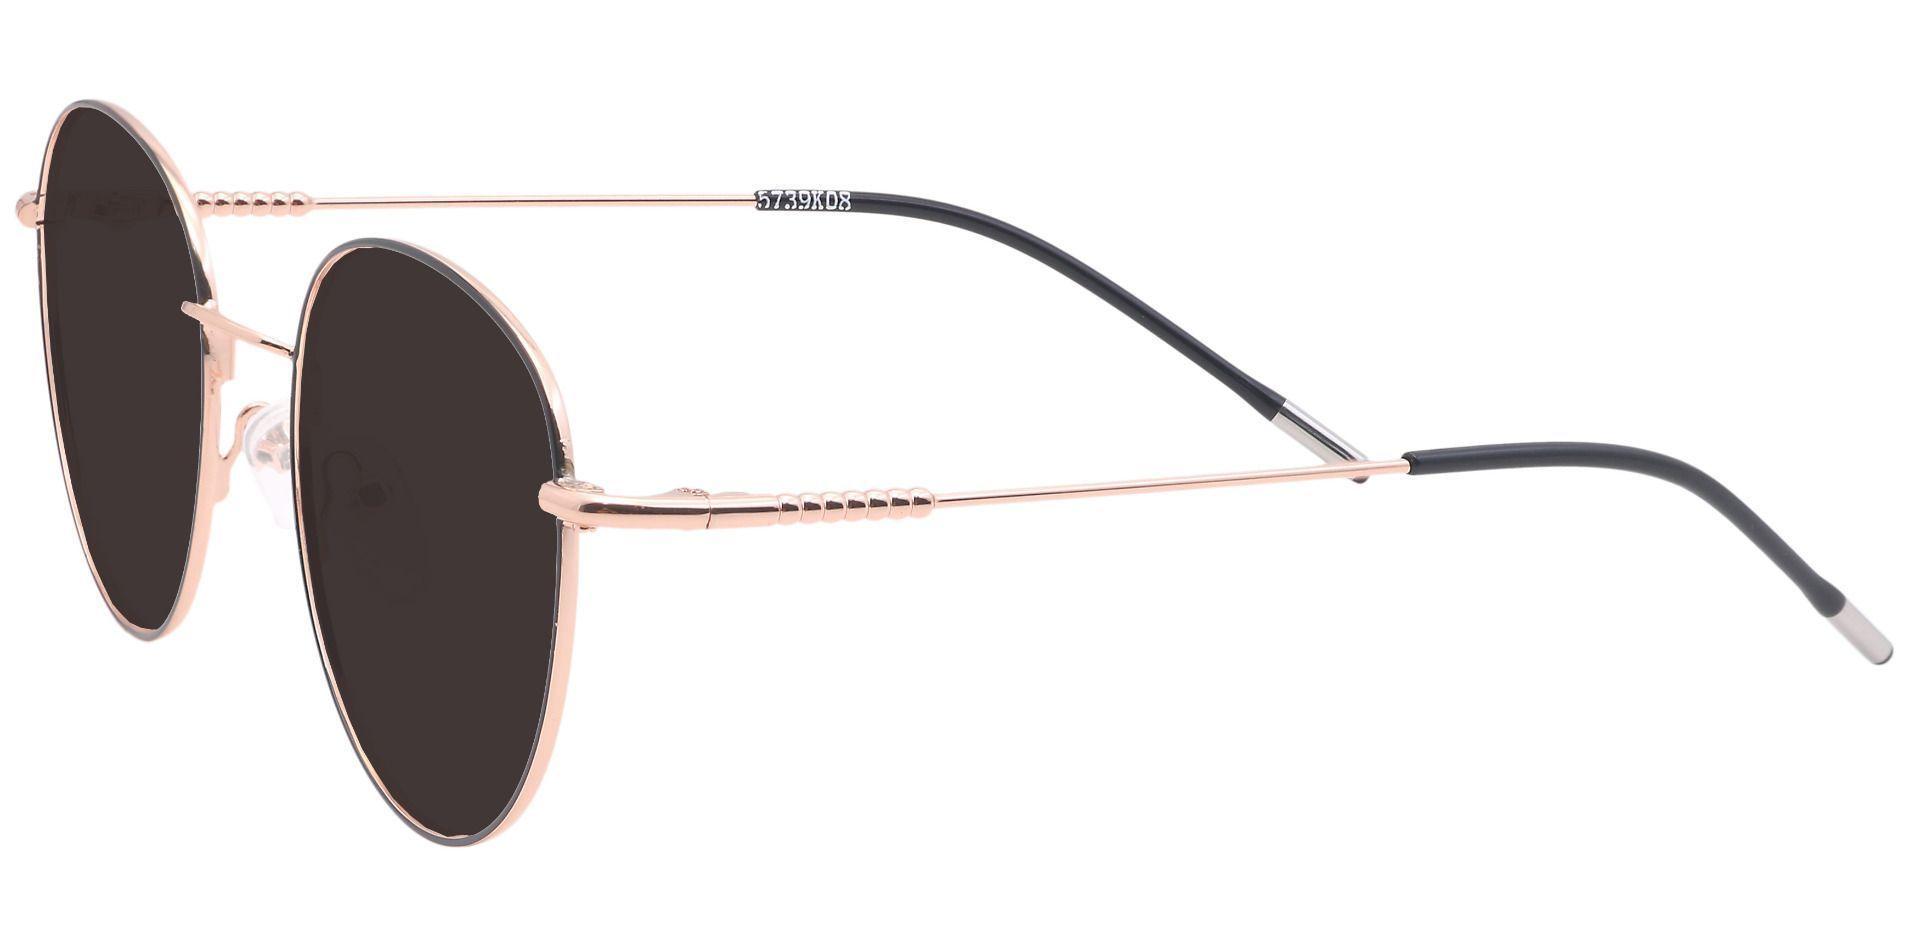 Keaton Oval Prescription Sunglasses - Black Frame With Gray Lenses